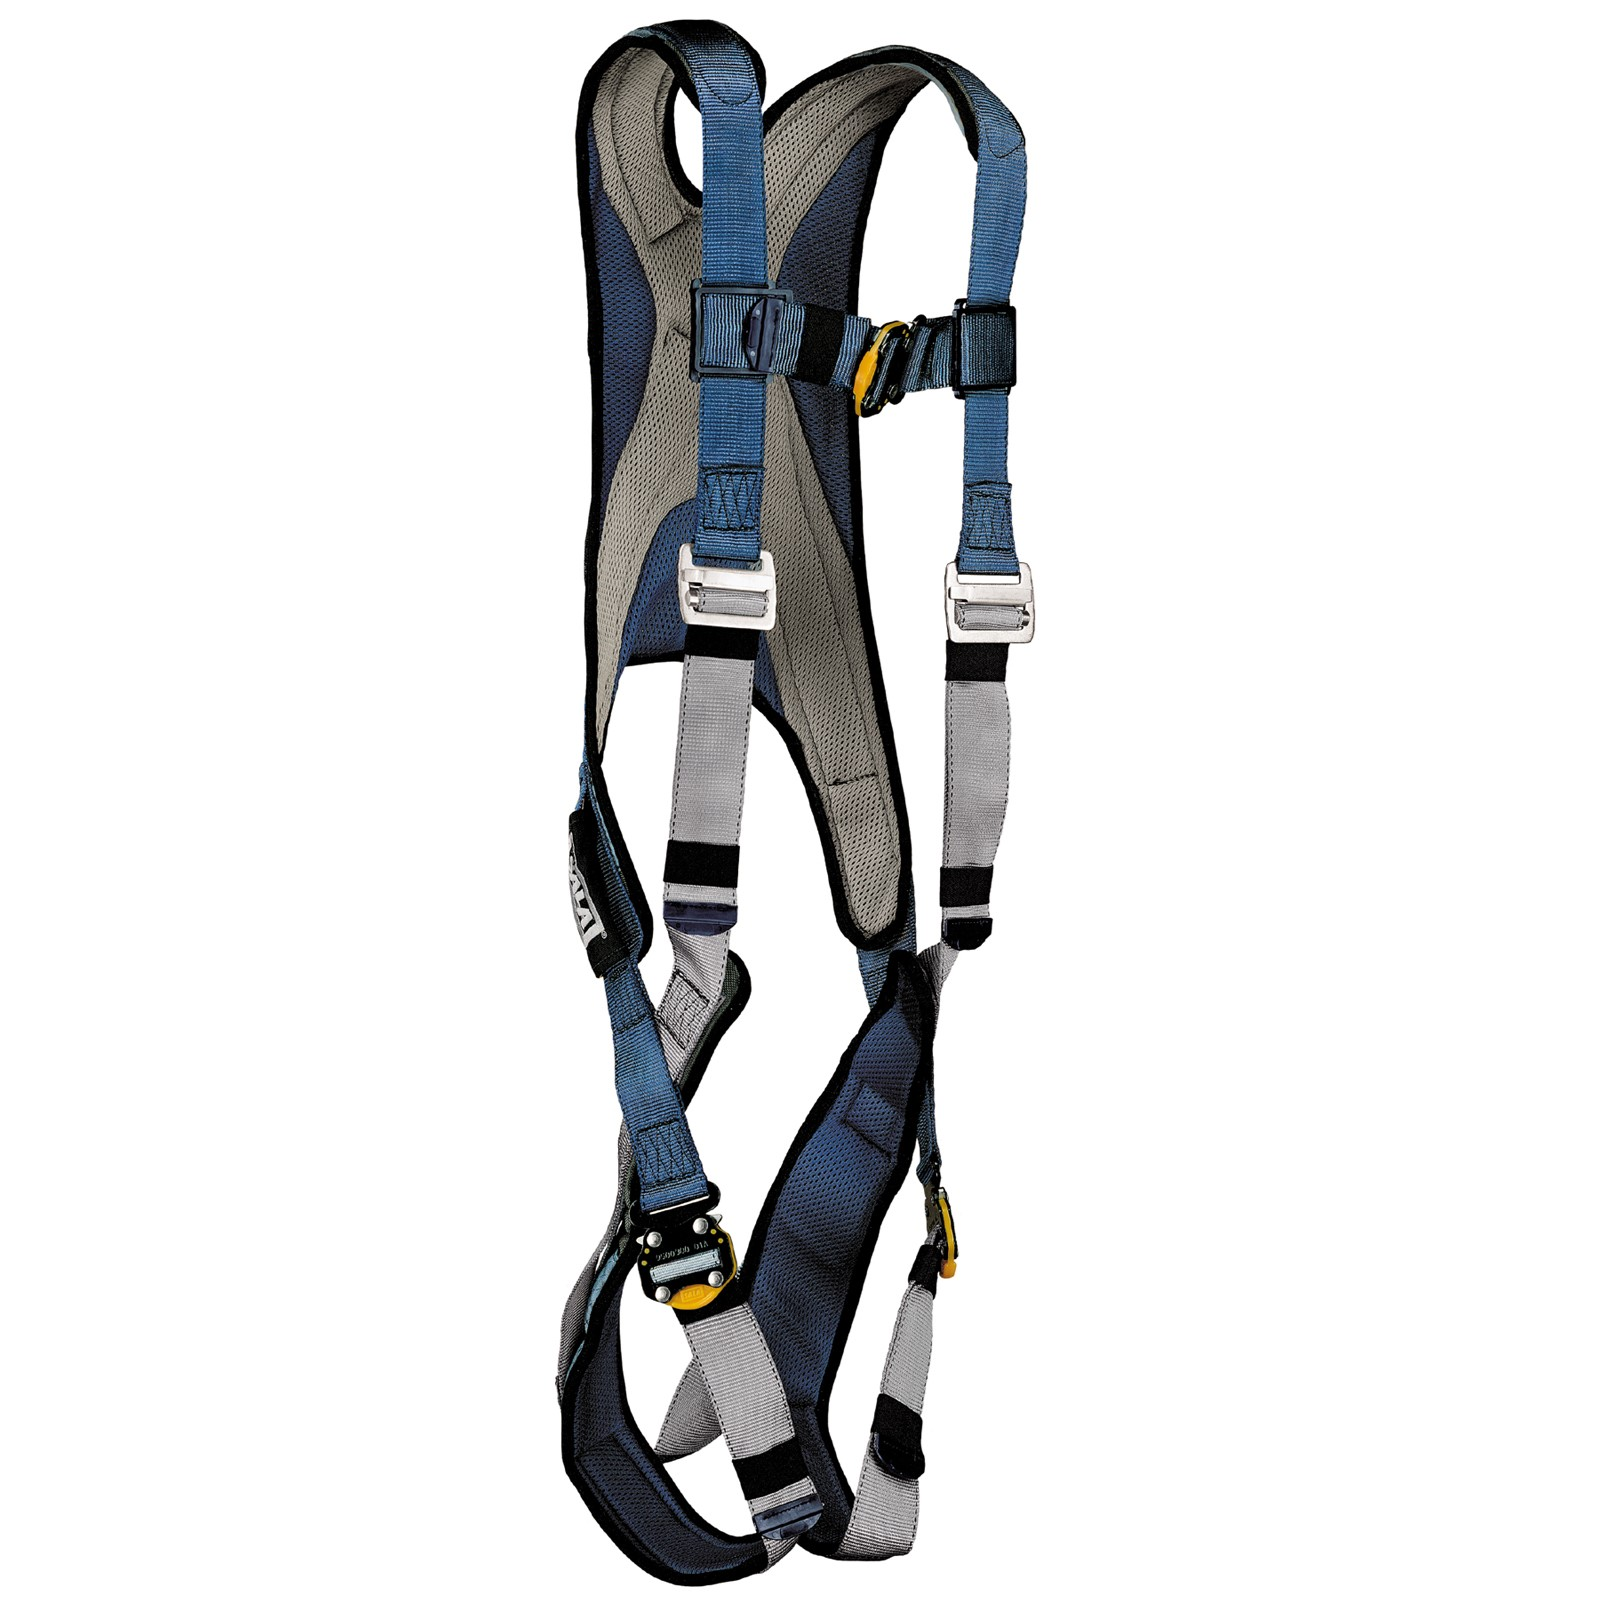 DBI SALA ExoFit Back D-Ring Fall Protection Harness Each | eBay